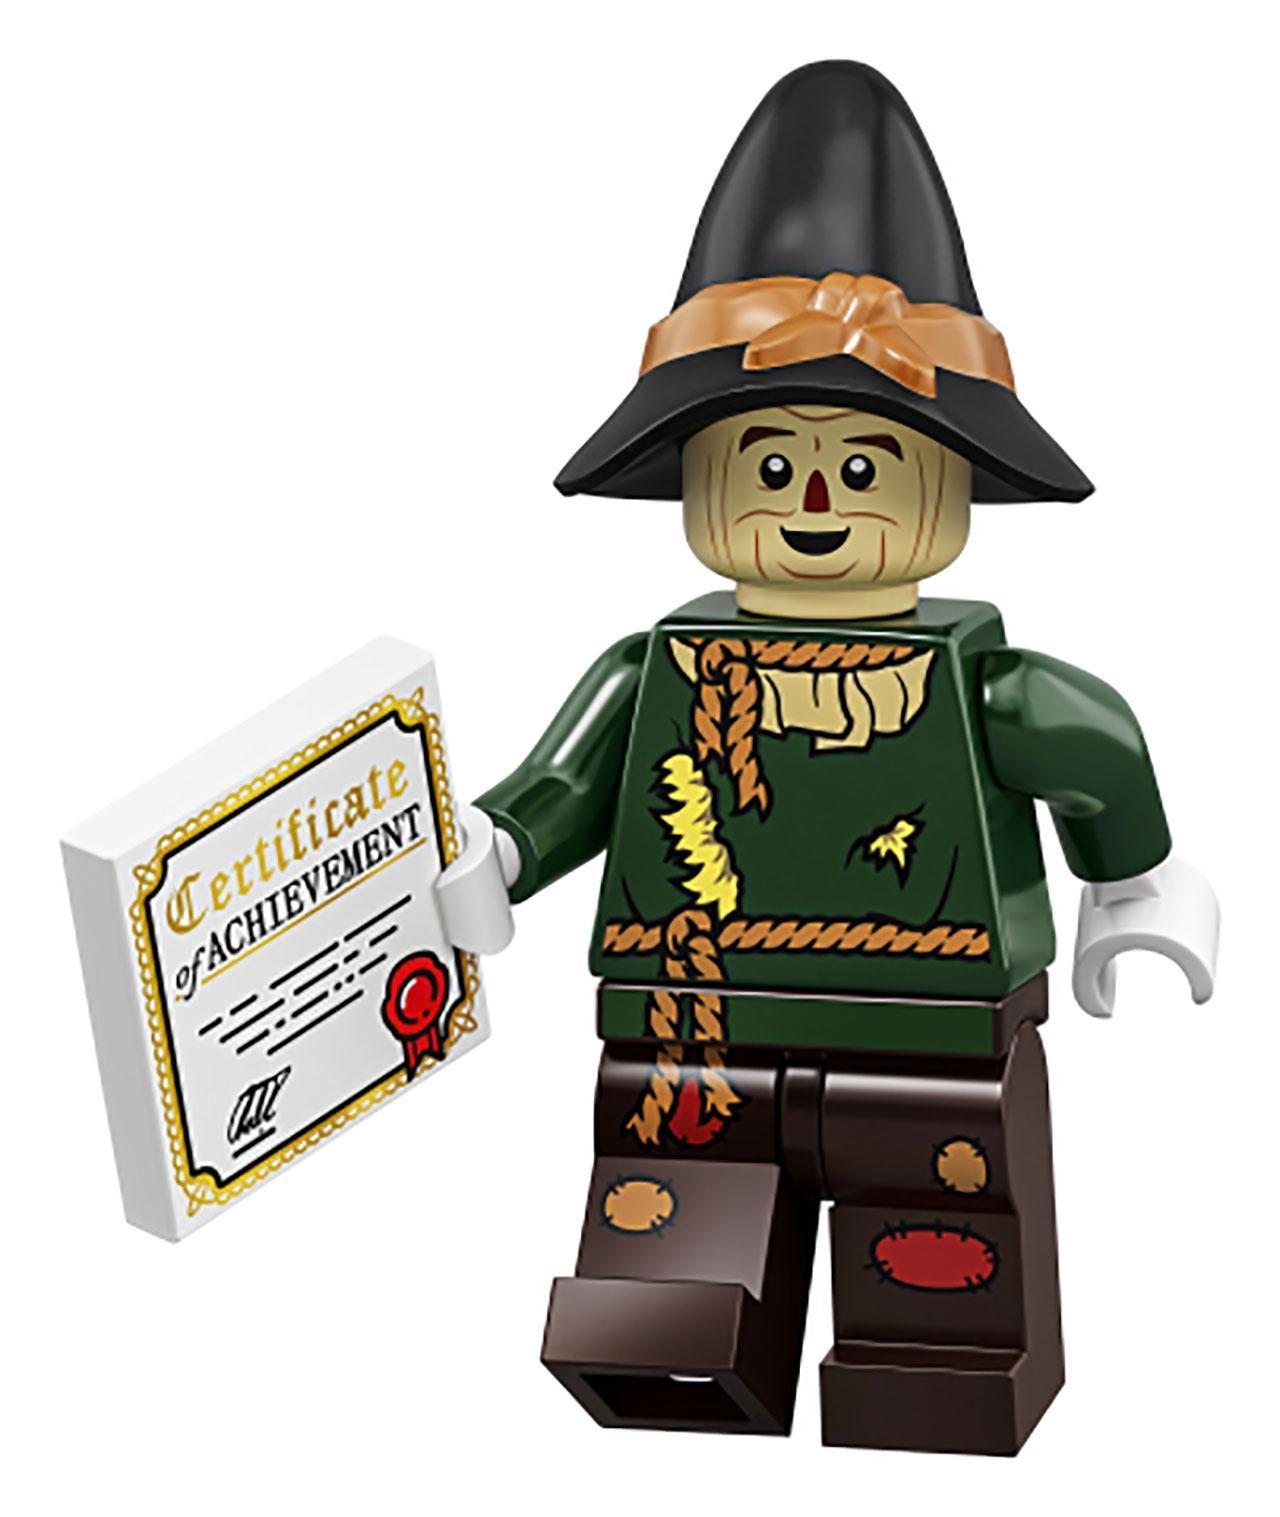 Lego Movie 2 Minifigure Packs Revealed Slashgear